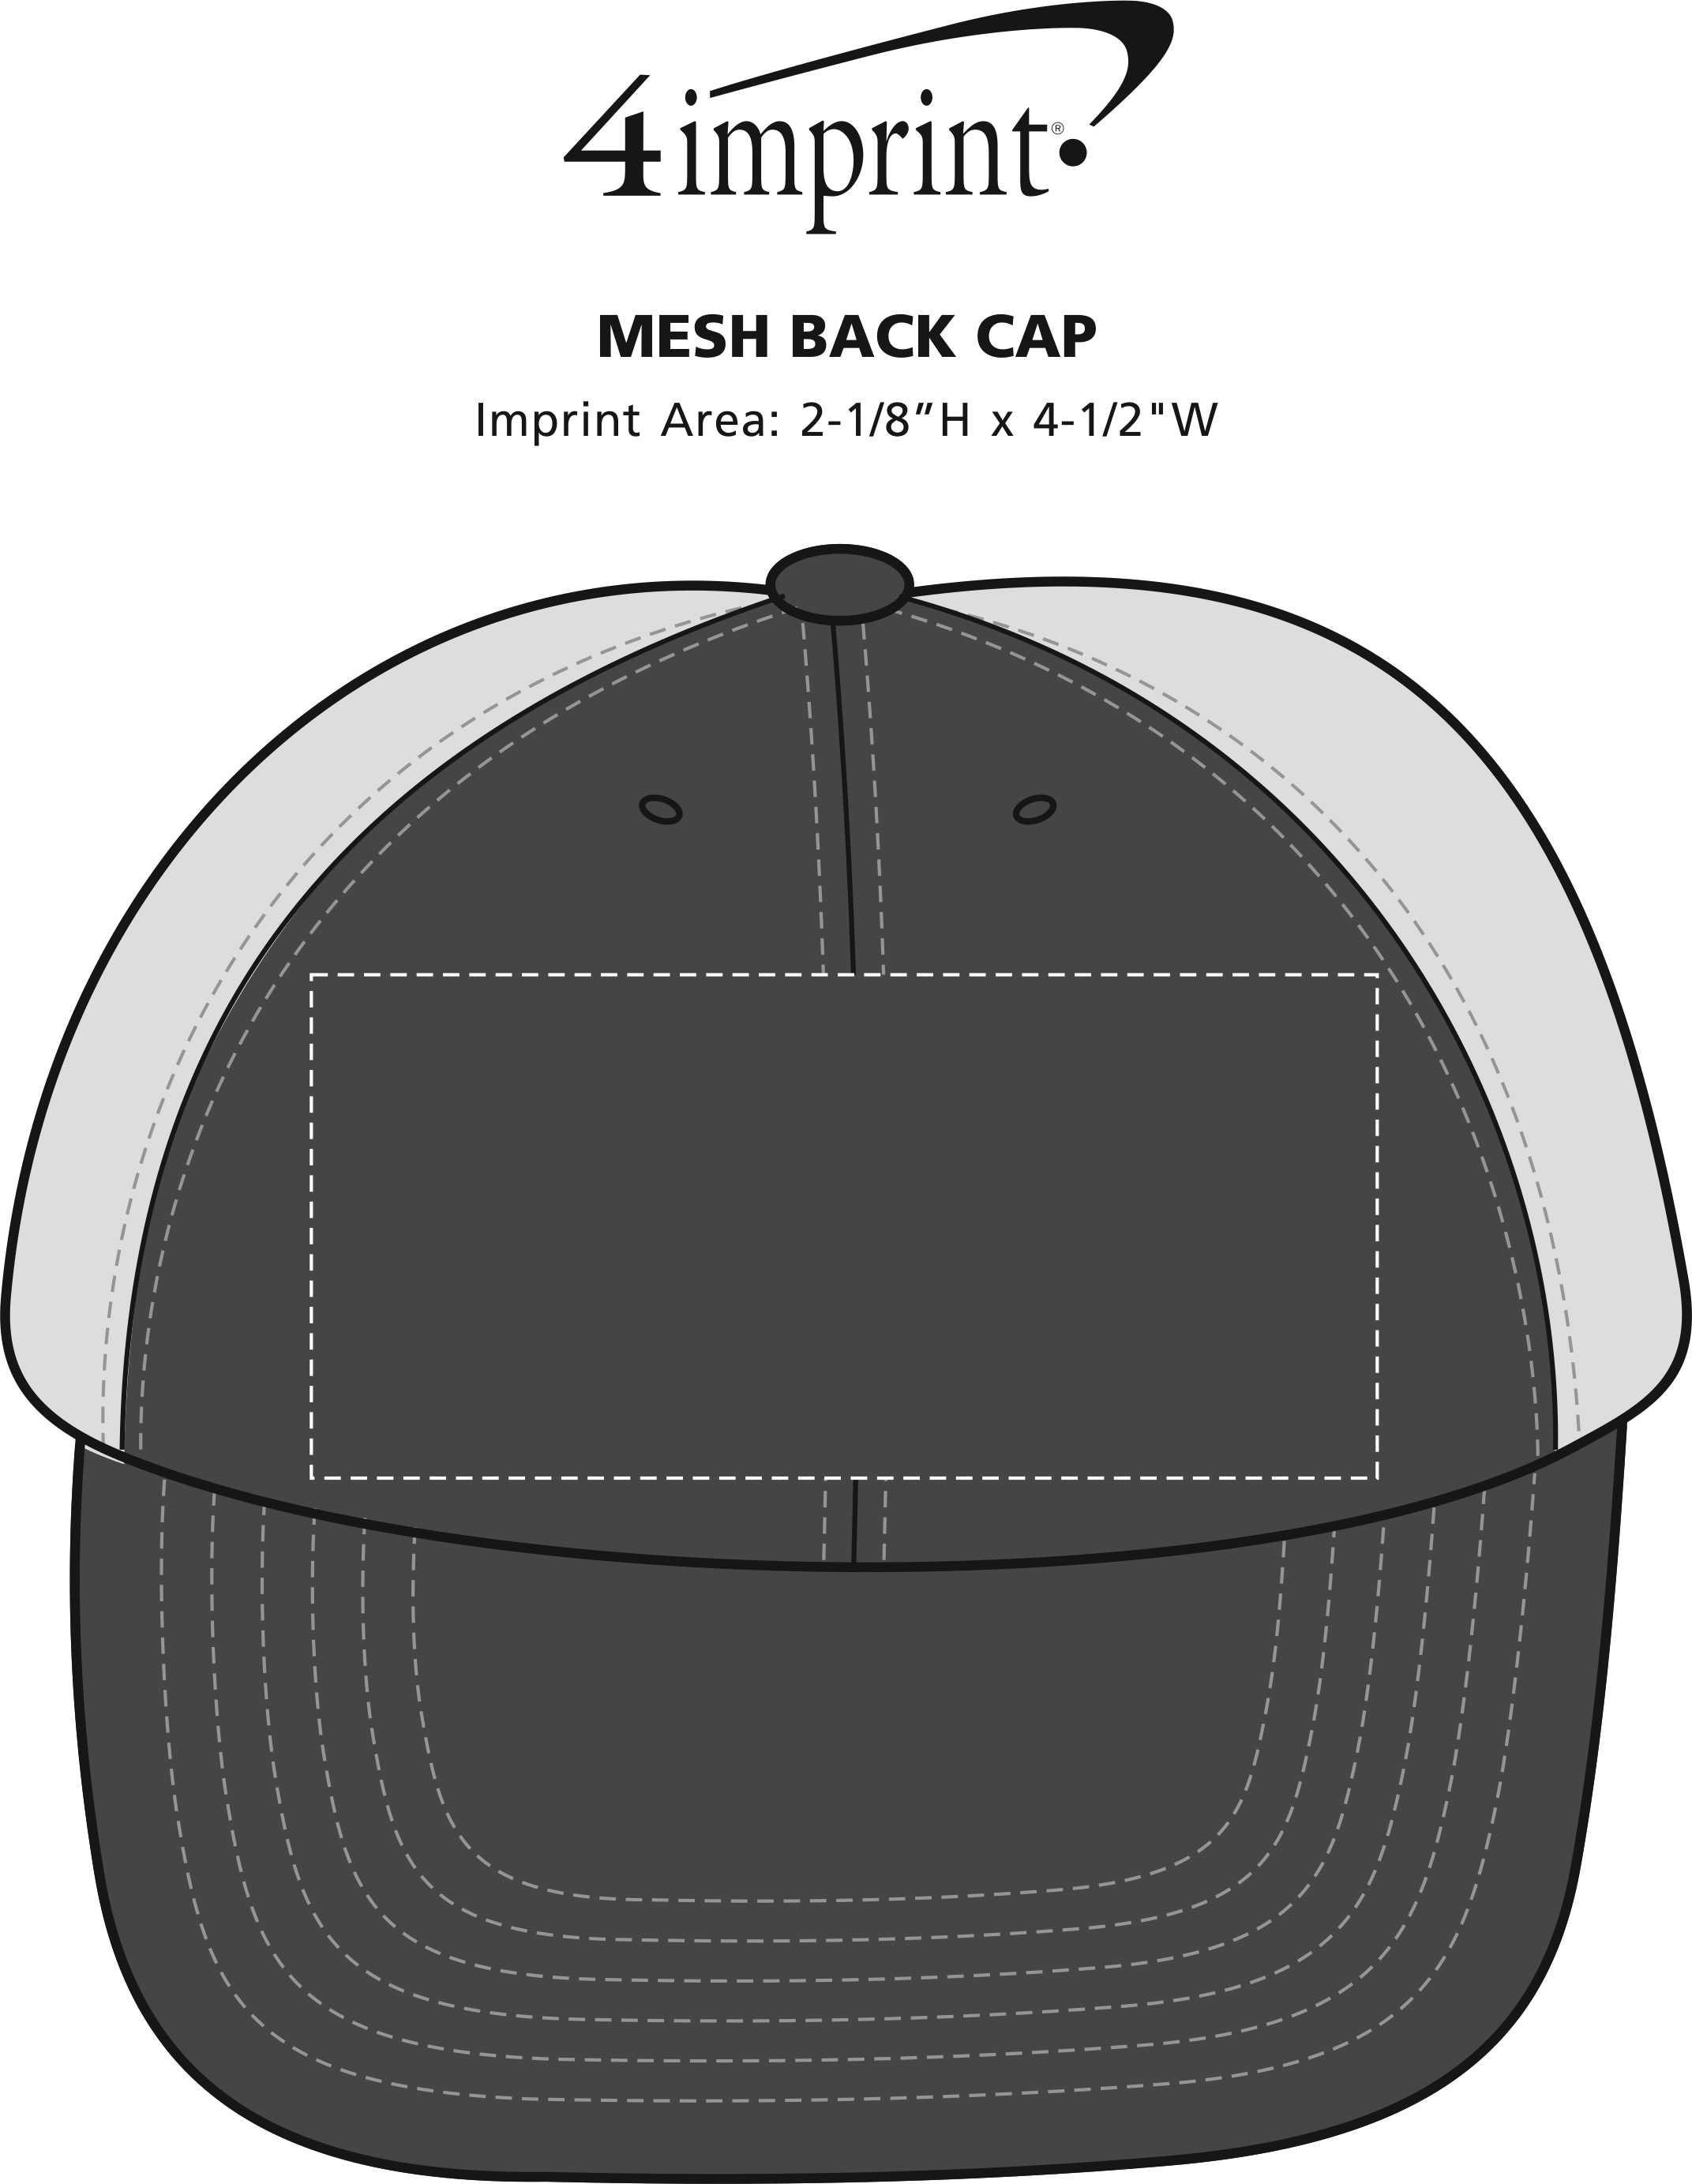 Imprint Area of Mesh Back Cap